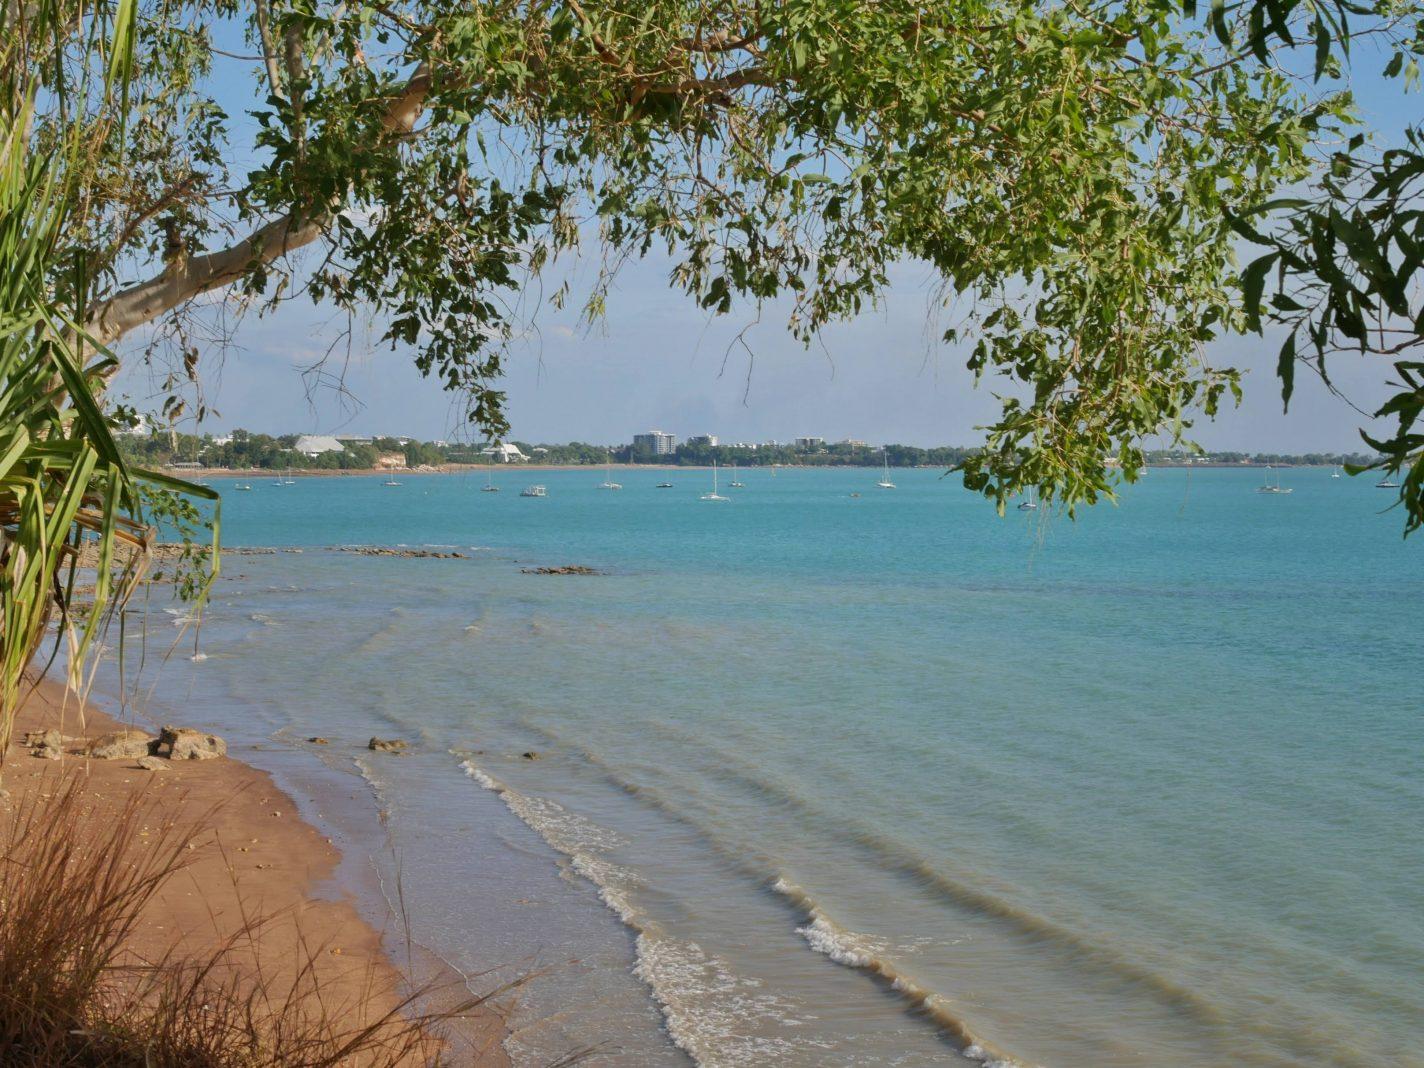 Prachtig blauw water bij Fannie Bay